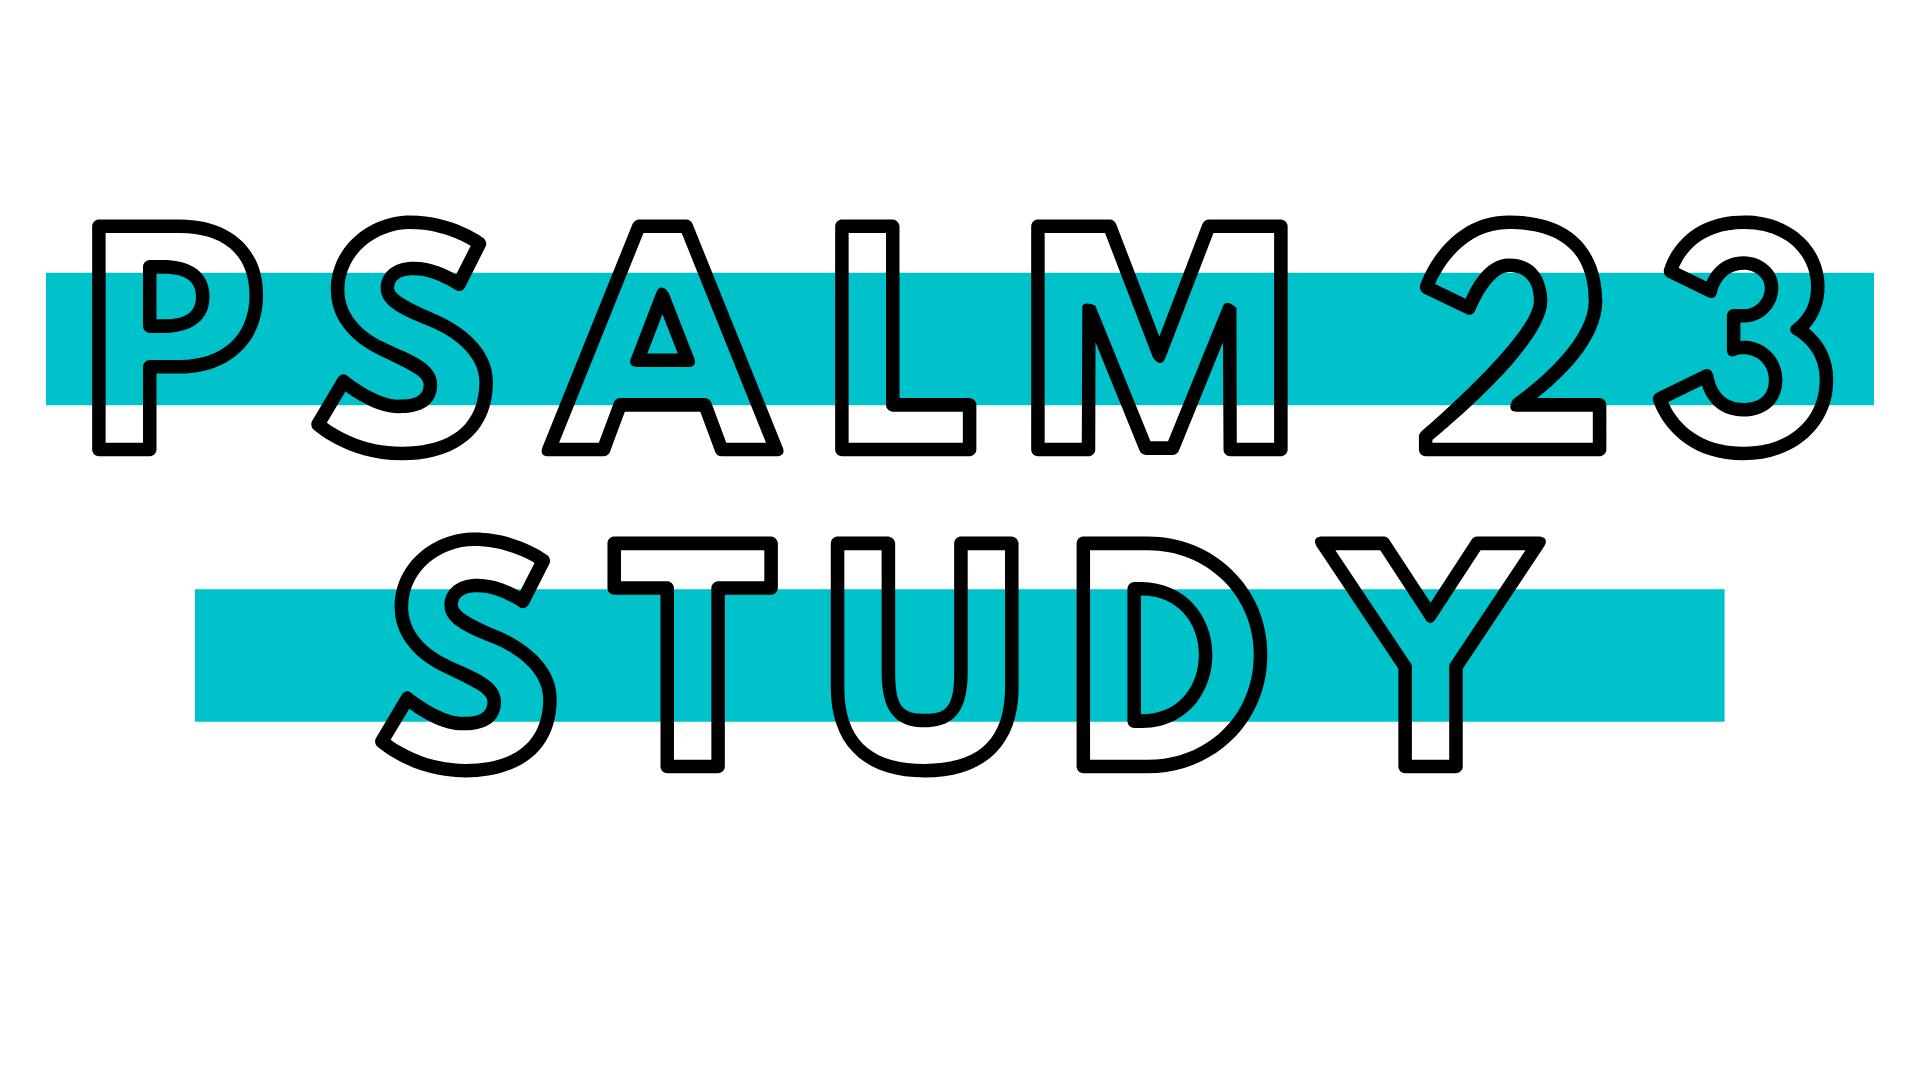 Psalm 23 Study